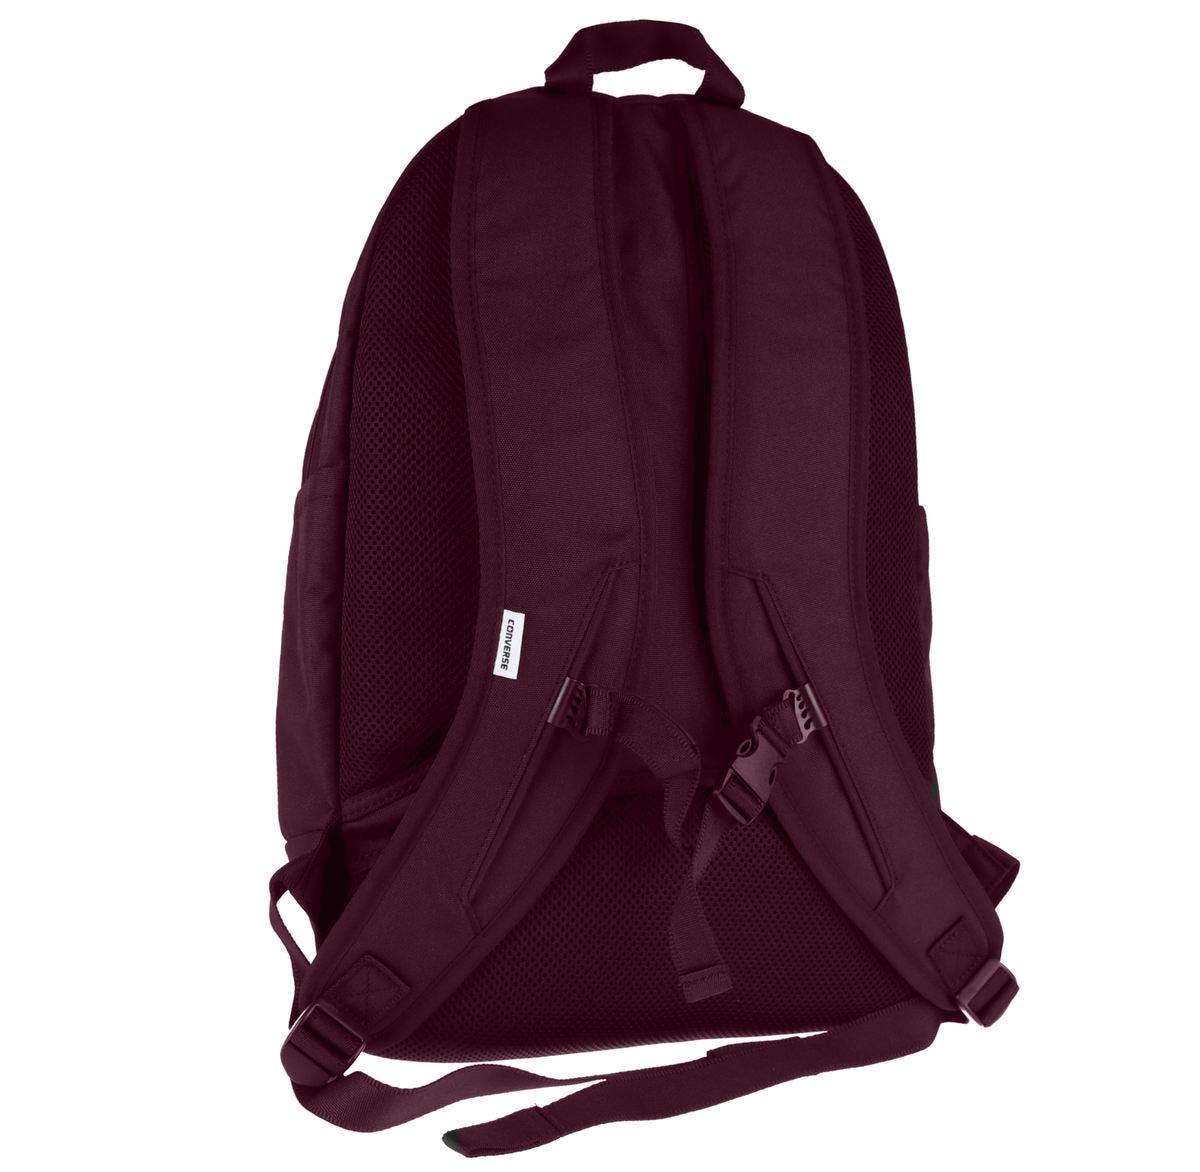 13cec50c0 Converse Poly Chuck Taylor Plus 1.0 Patch Backpack-Black | eBay